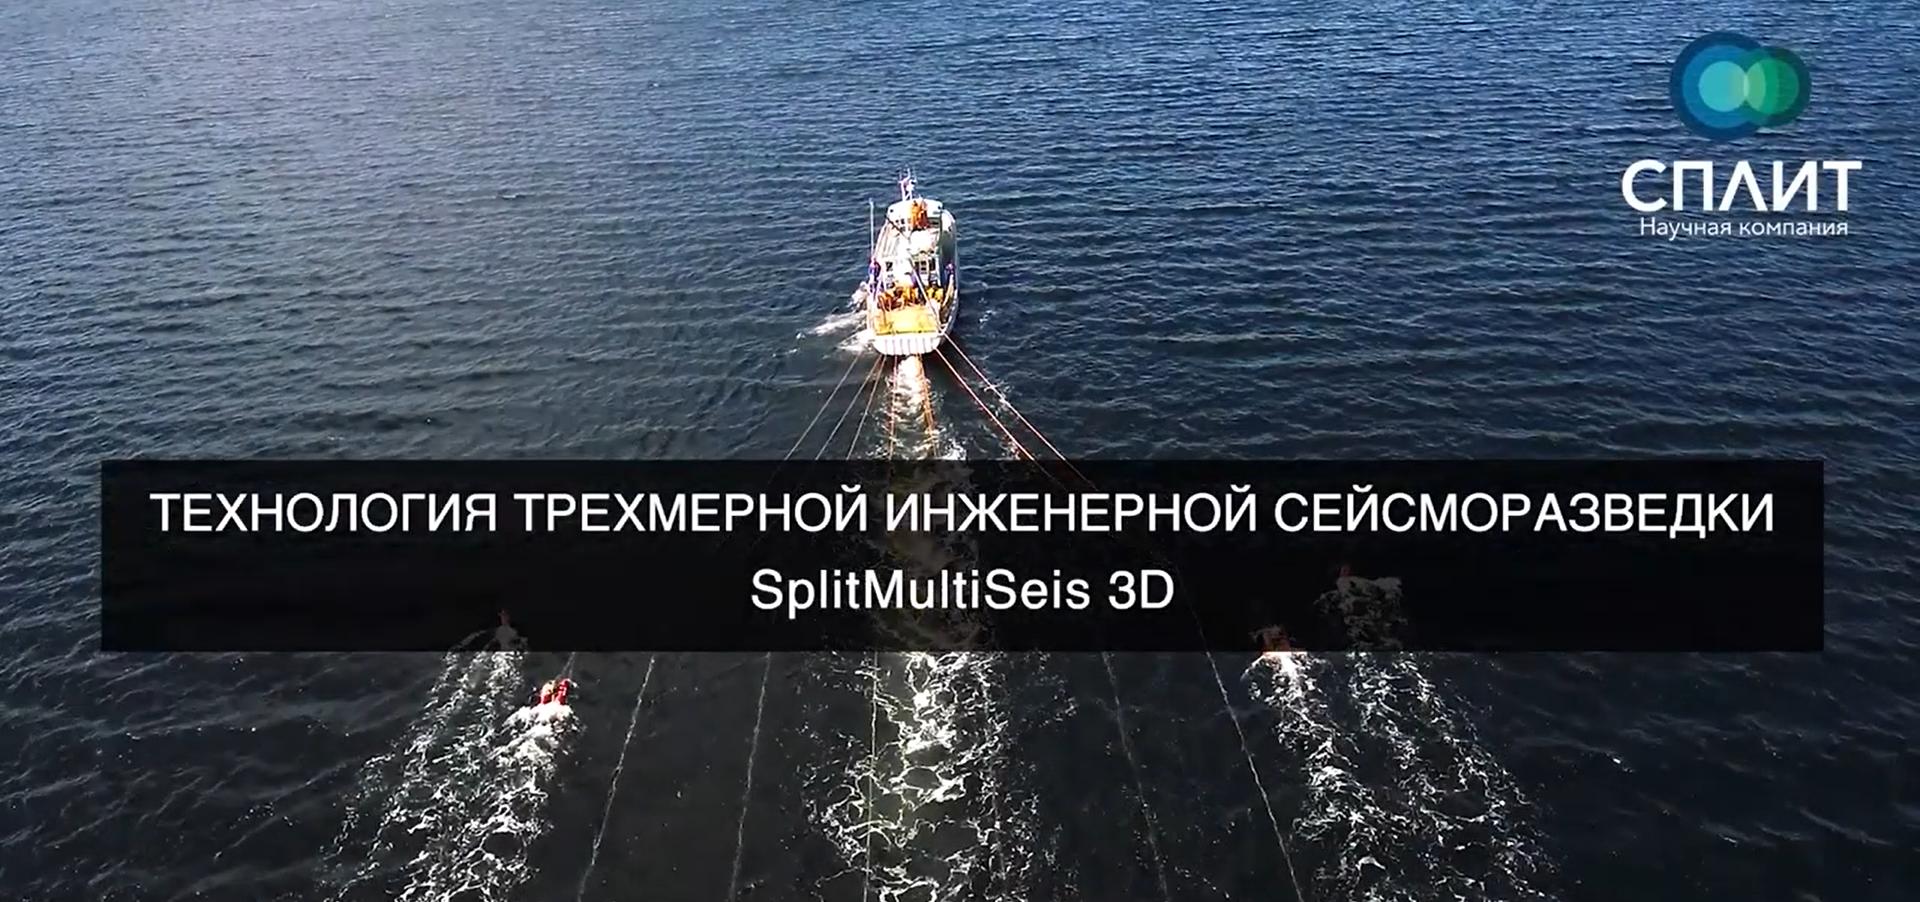 Very high resolution 3D seismic survey SplitMultiSeis 3D